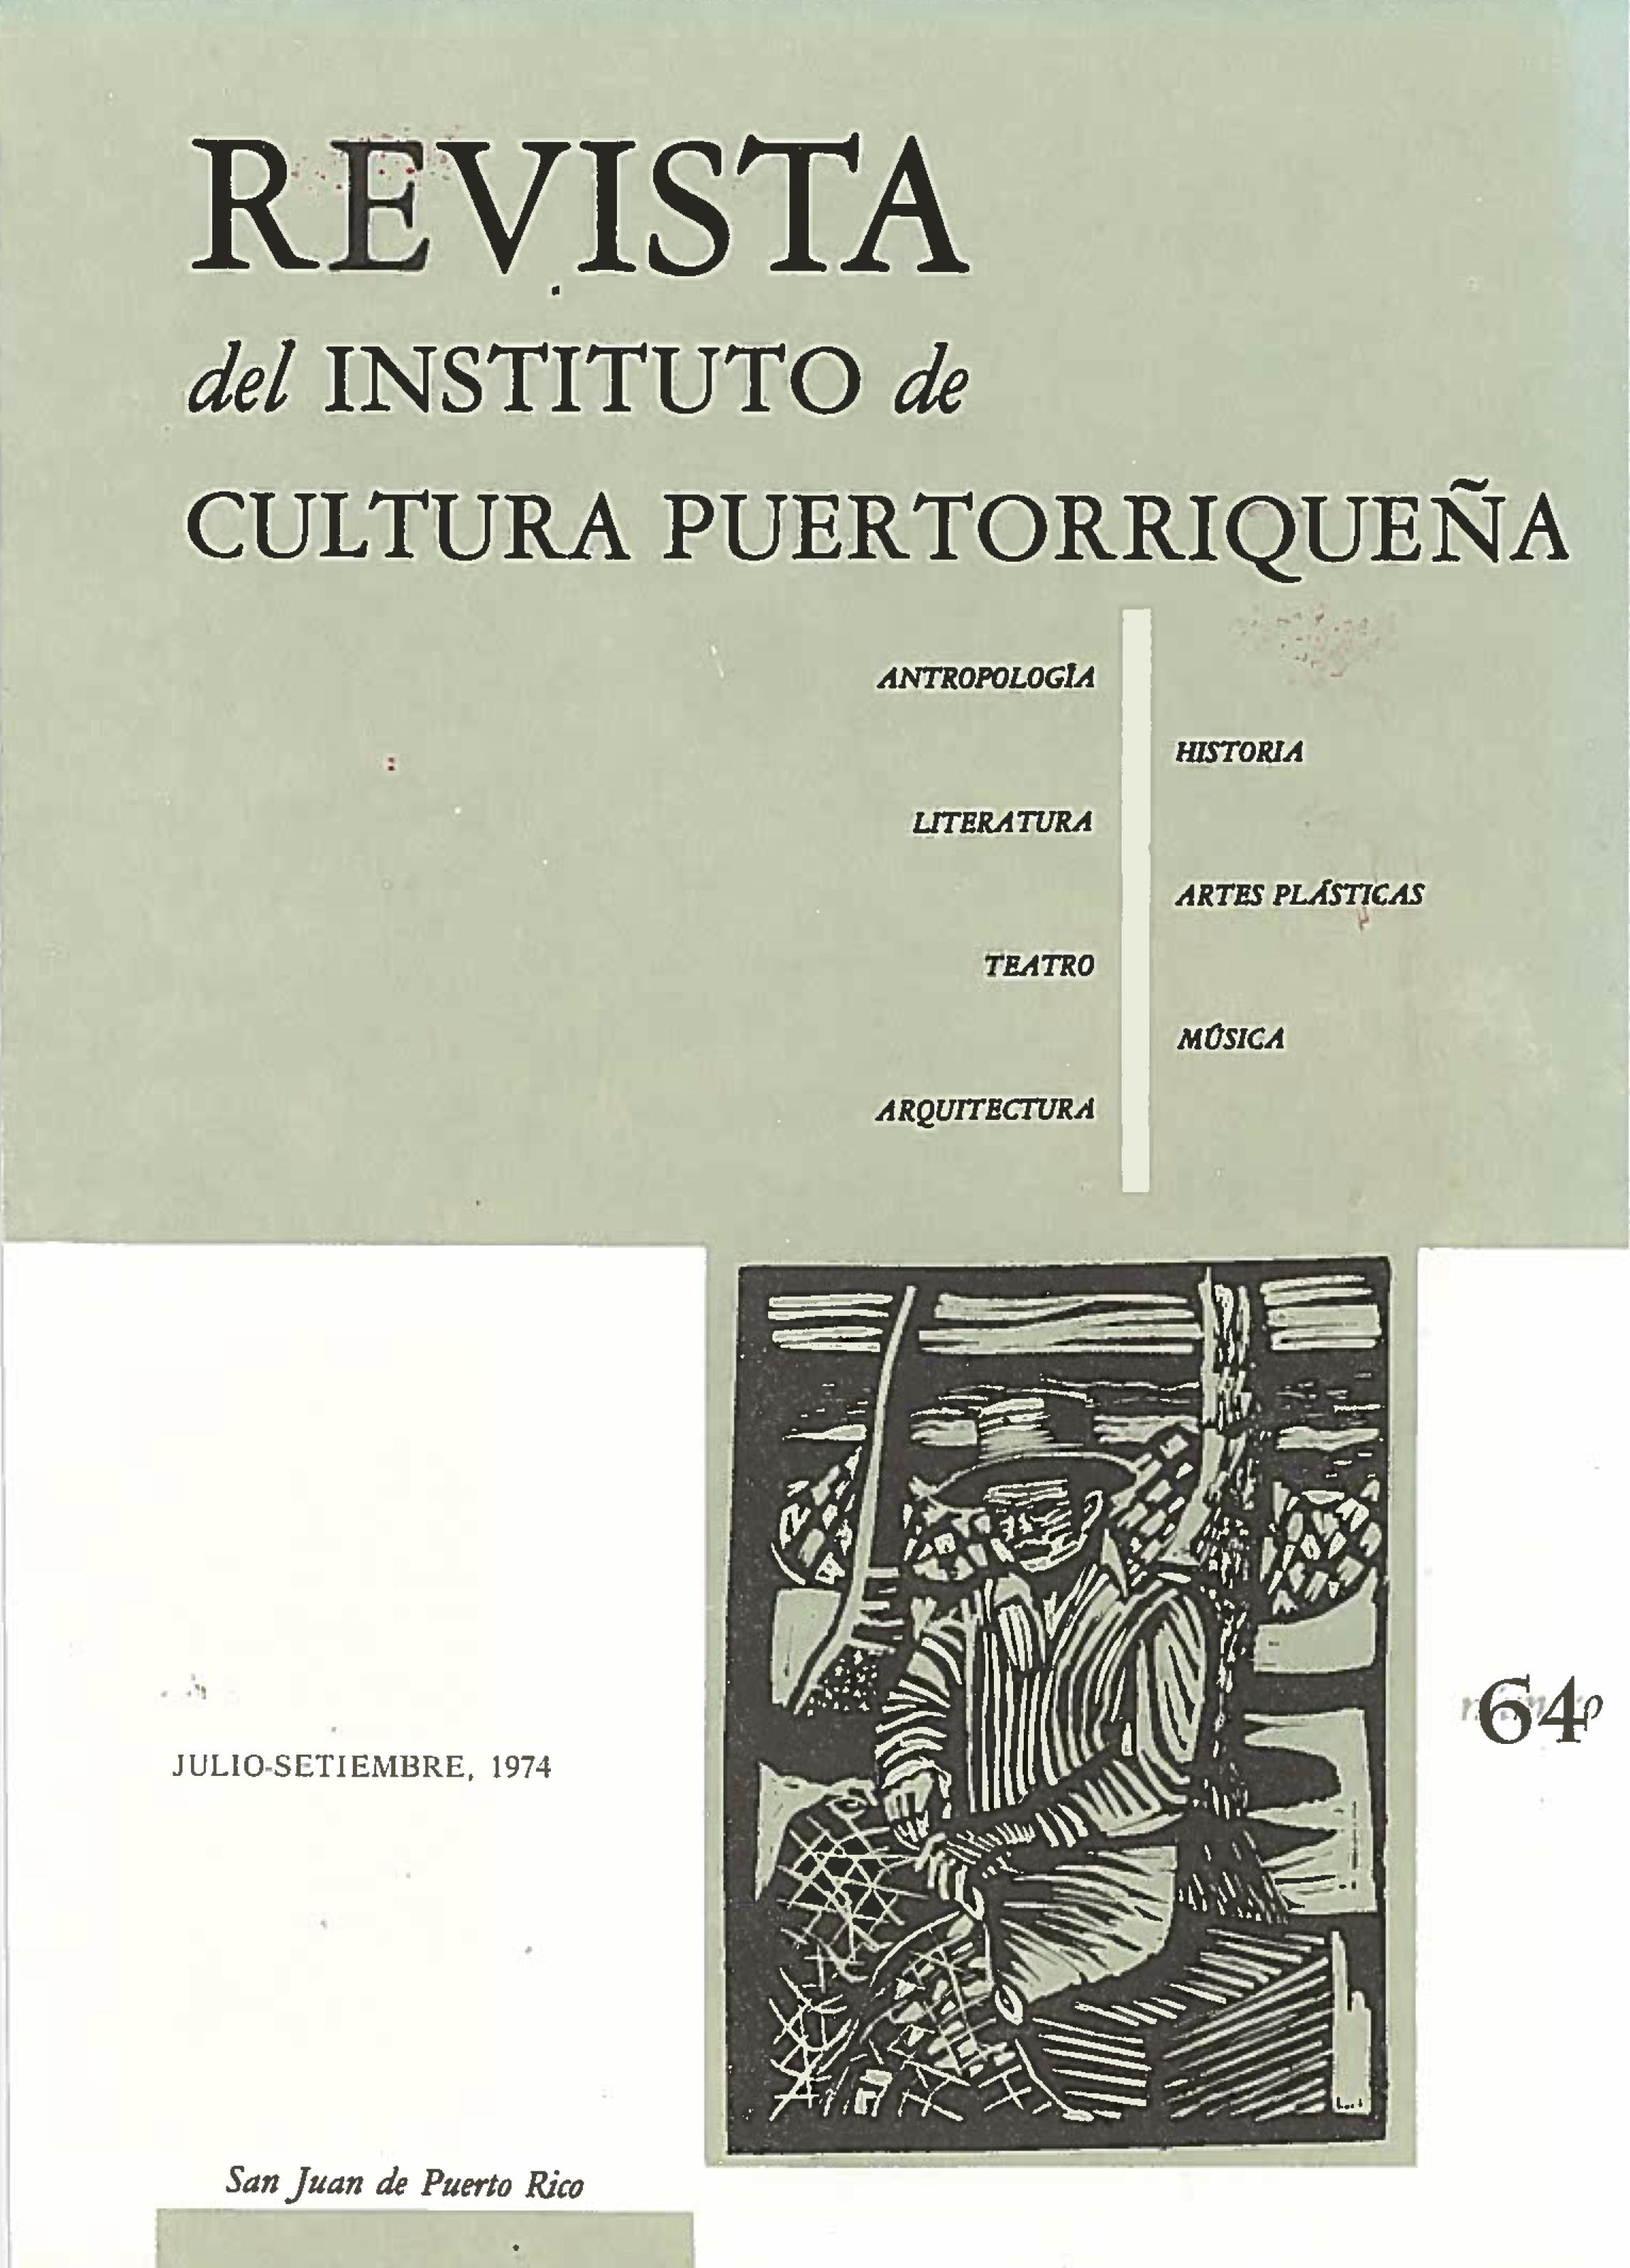 Número 64 / 1974